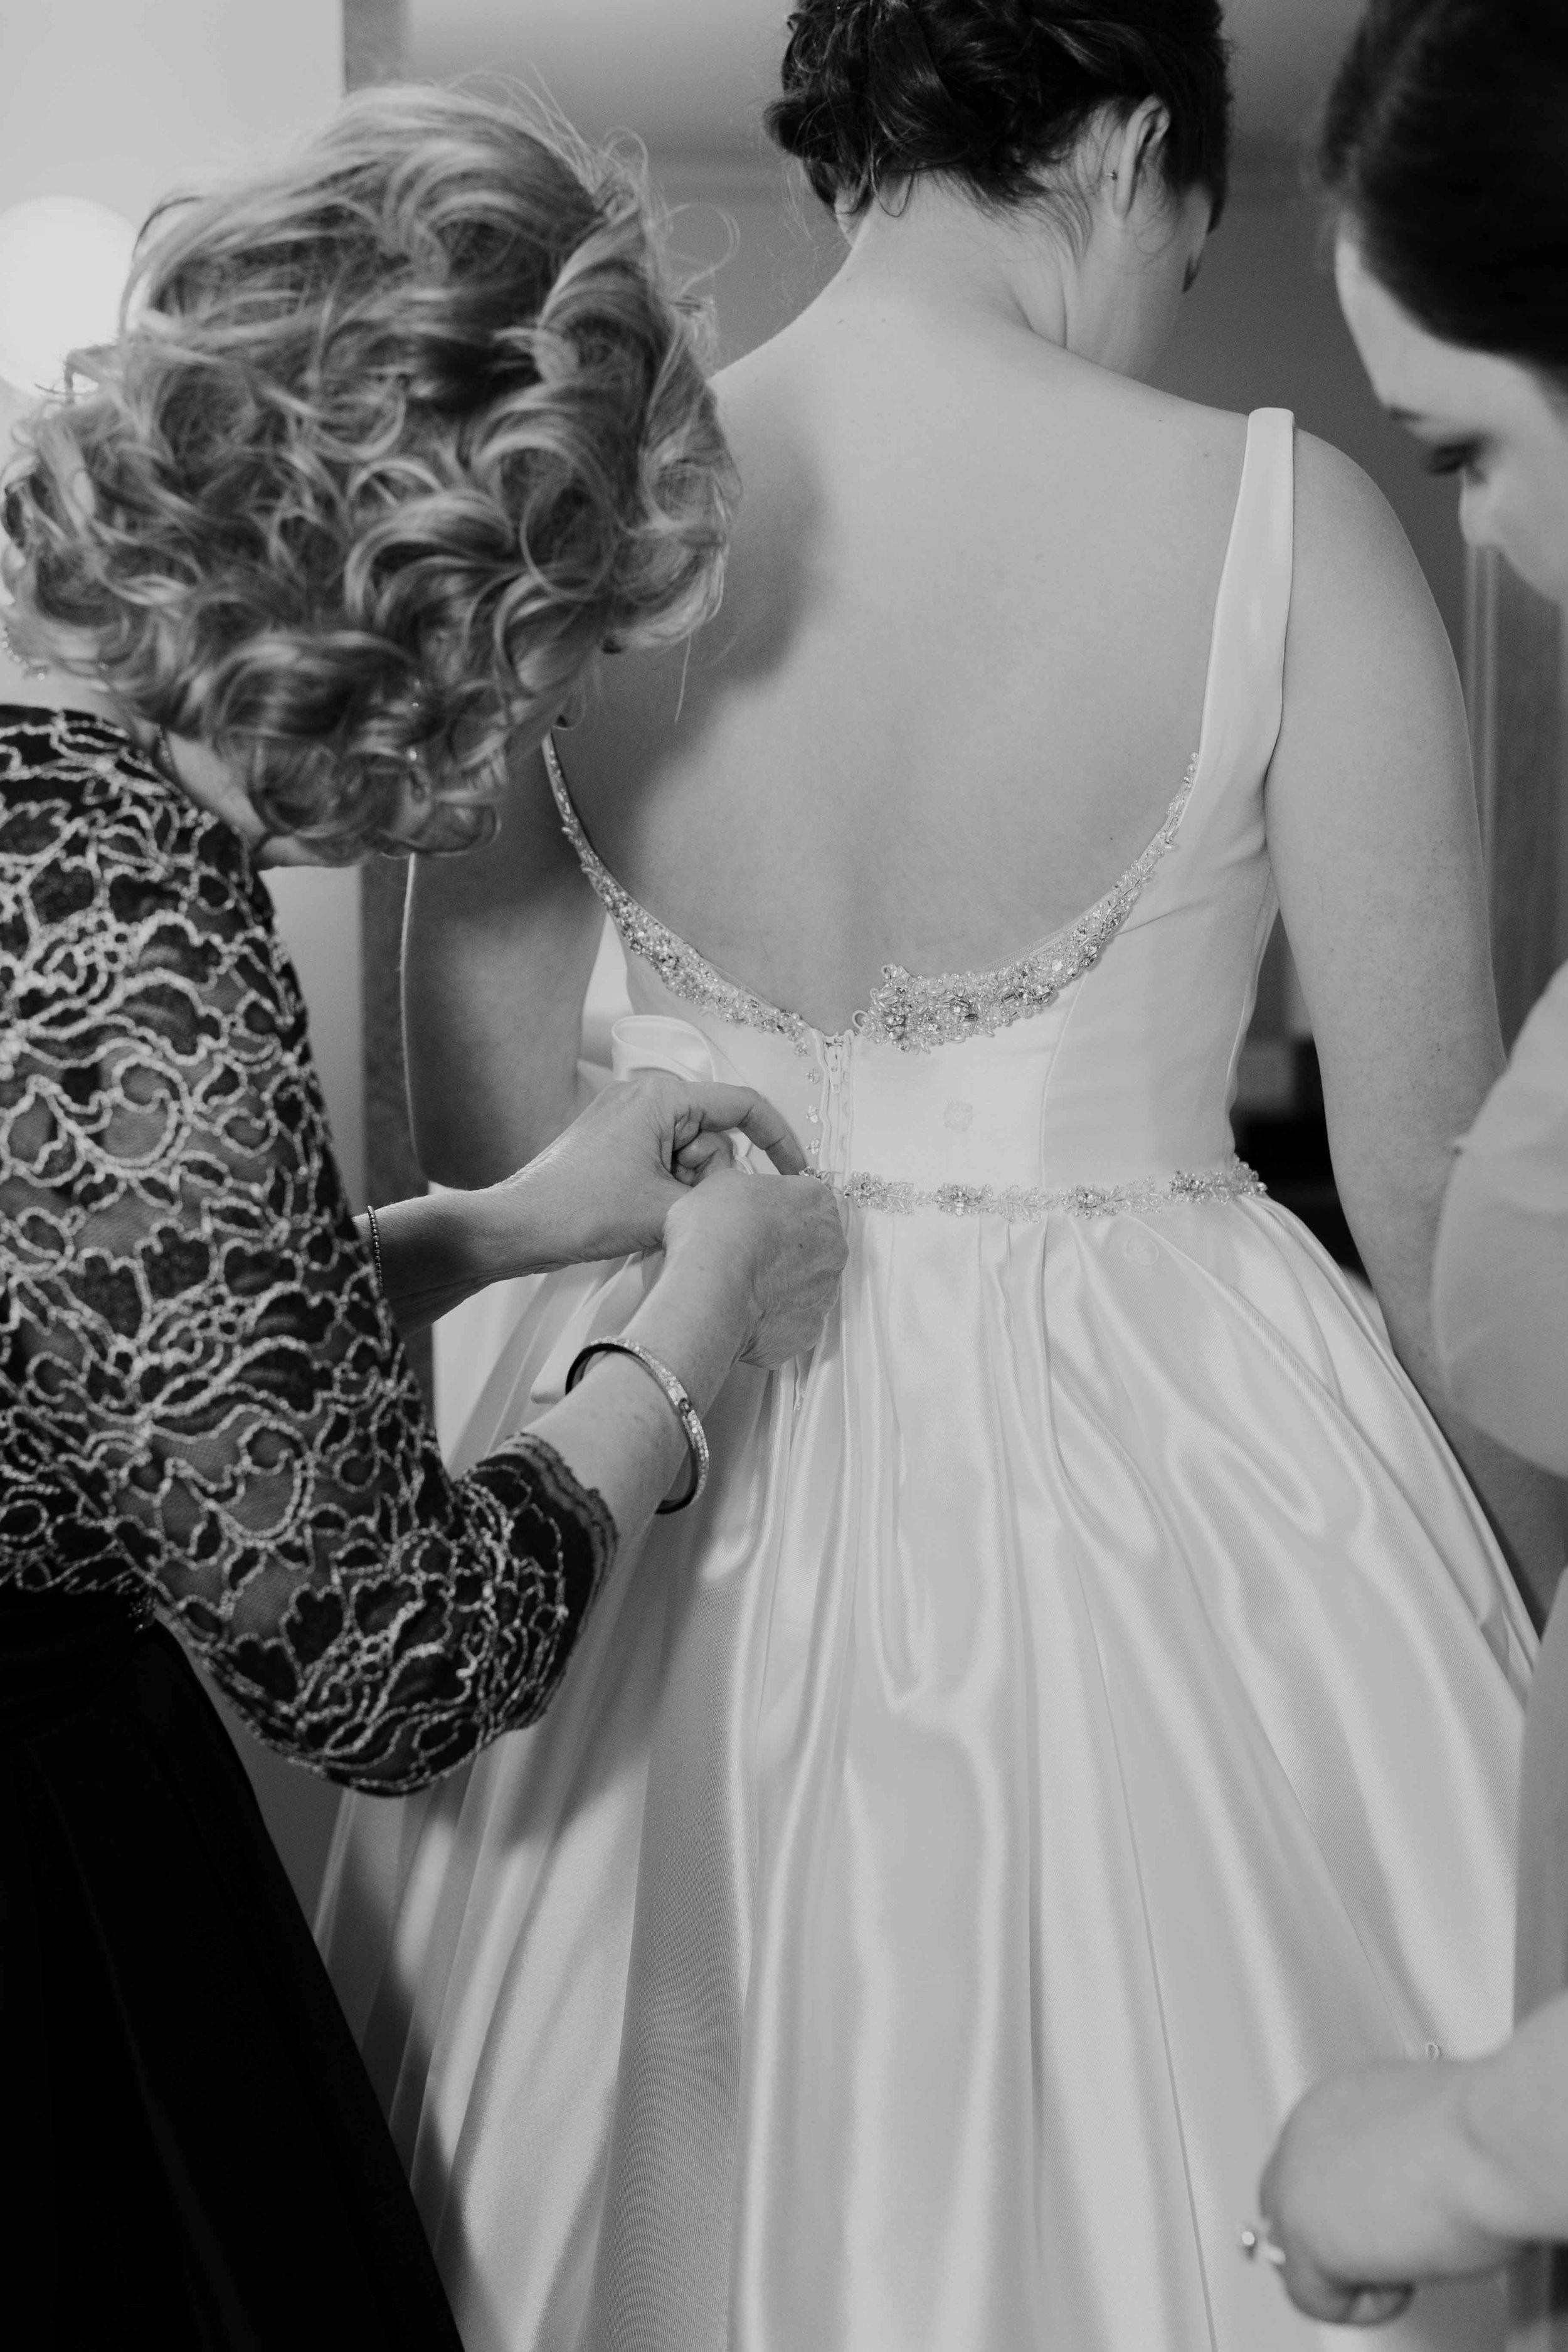 Farmville-Virginia-Wedding-Hotel-Weynoke-Downtown-Jacqueline-Waters-Photography-Detailed- (169).jpg